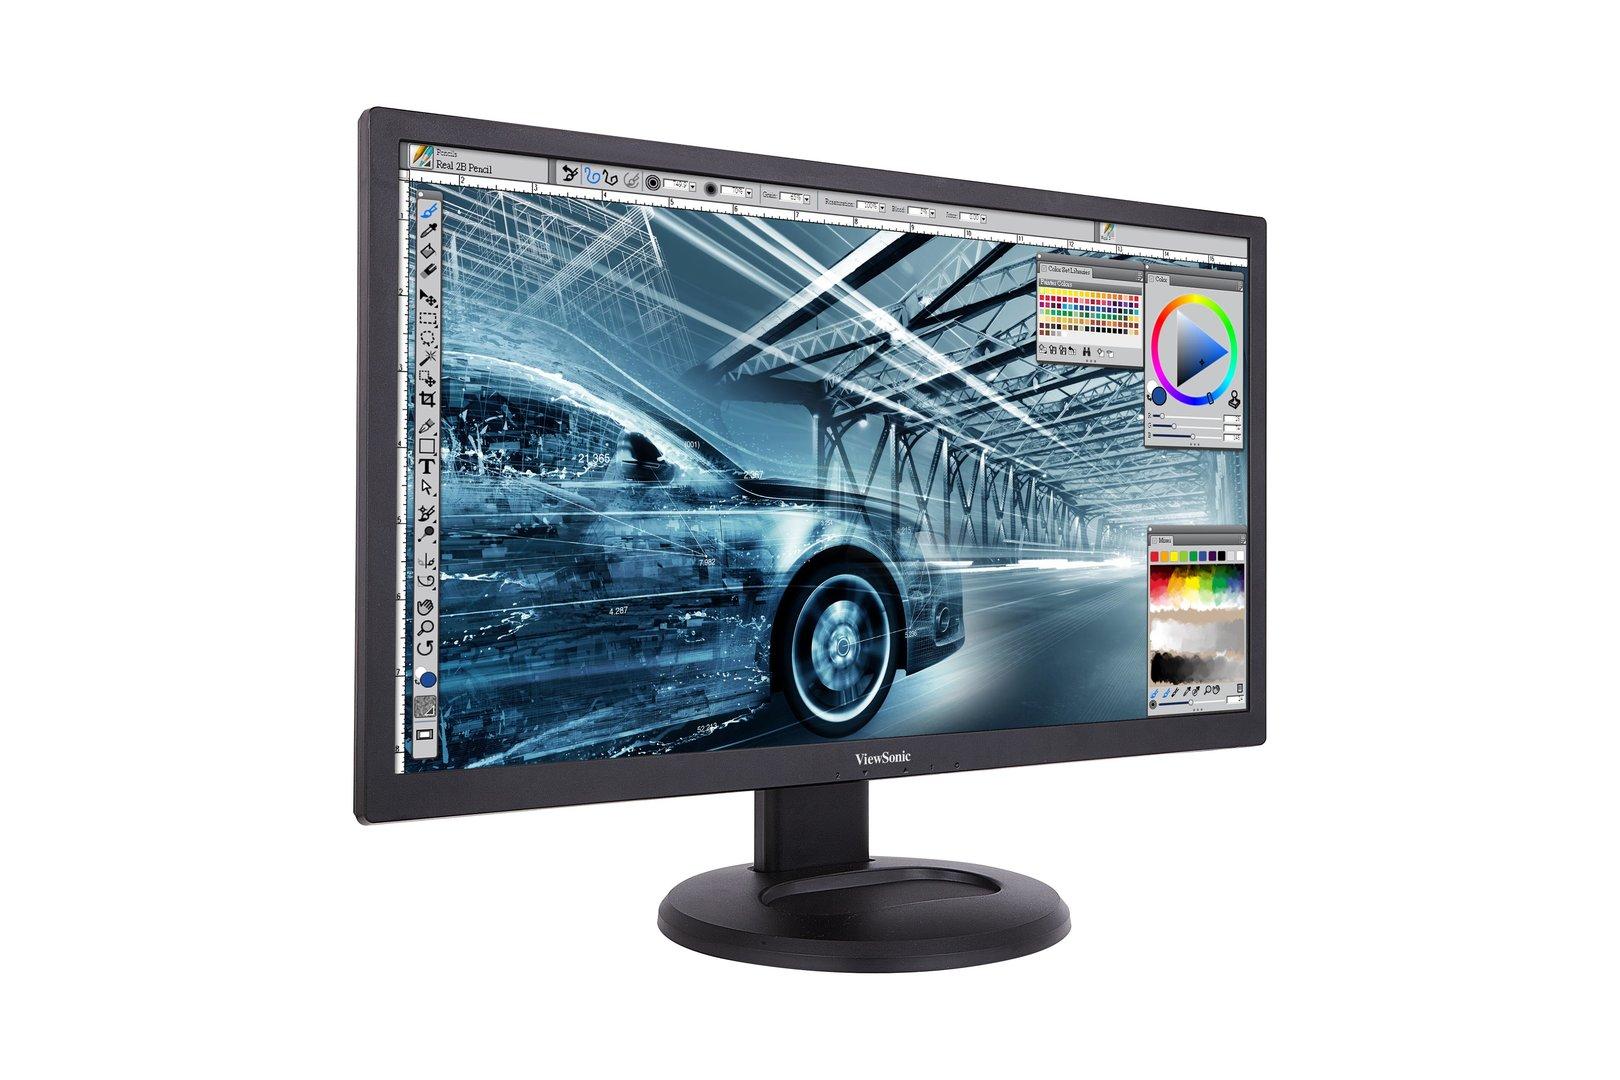 ViewSonic VG2860mhl mit Ultra HD